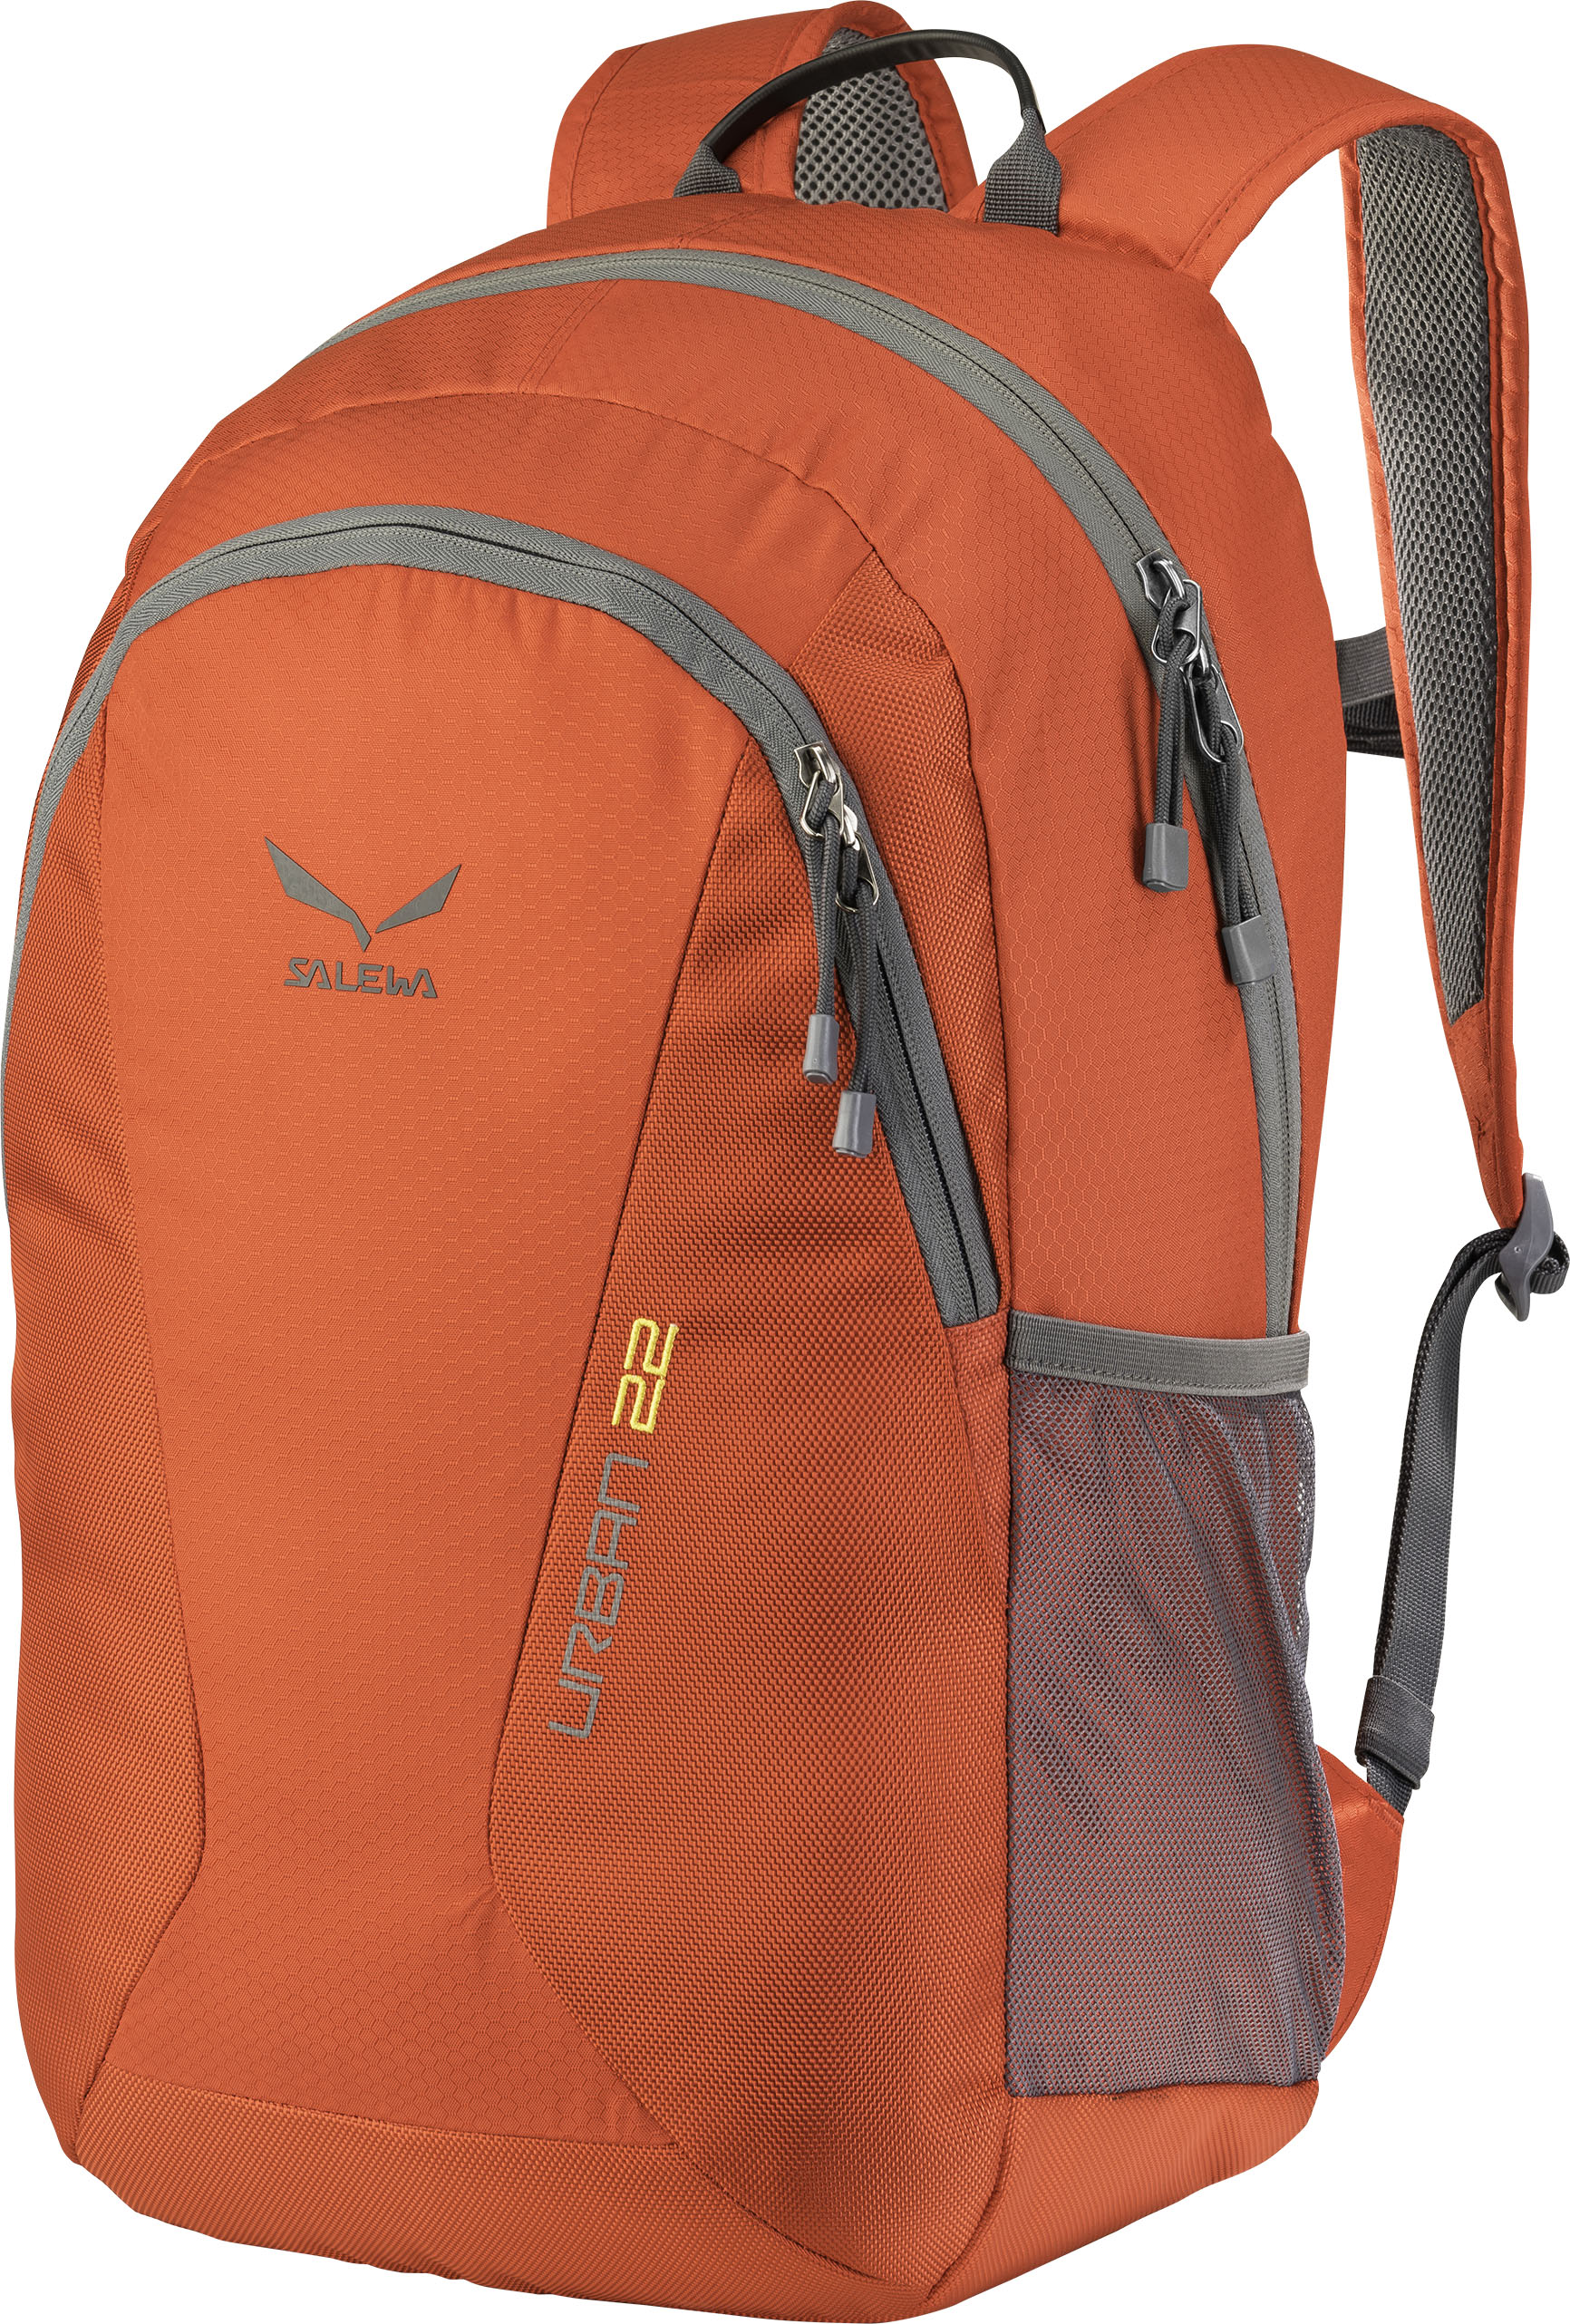 Купить Рюкзак Salewa Daypacks URBAN 22 BP FLAME / Рюкзаки городские 1166636